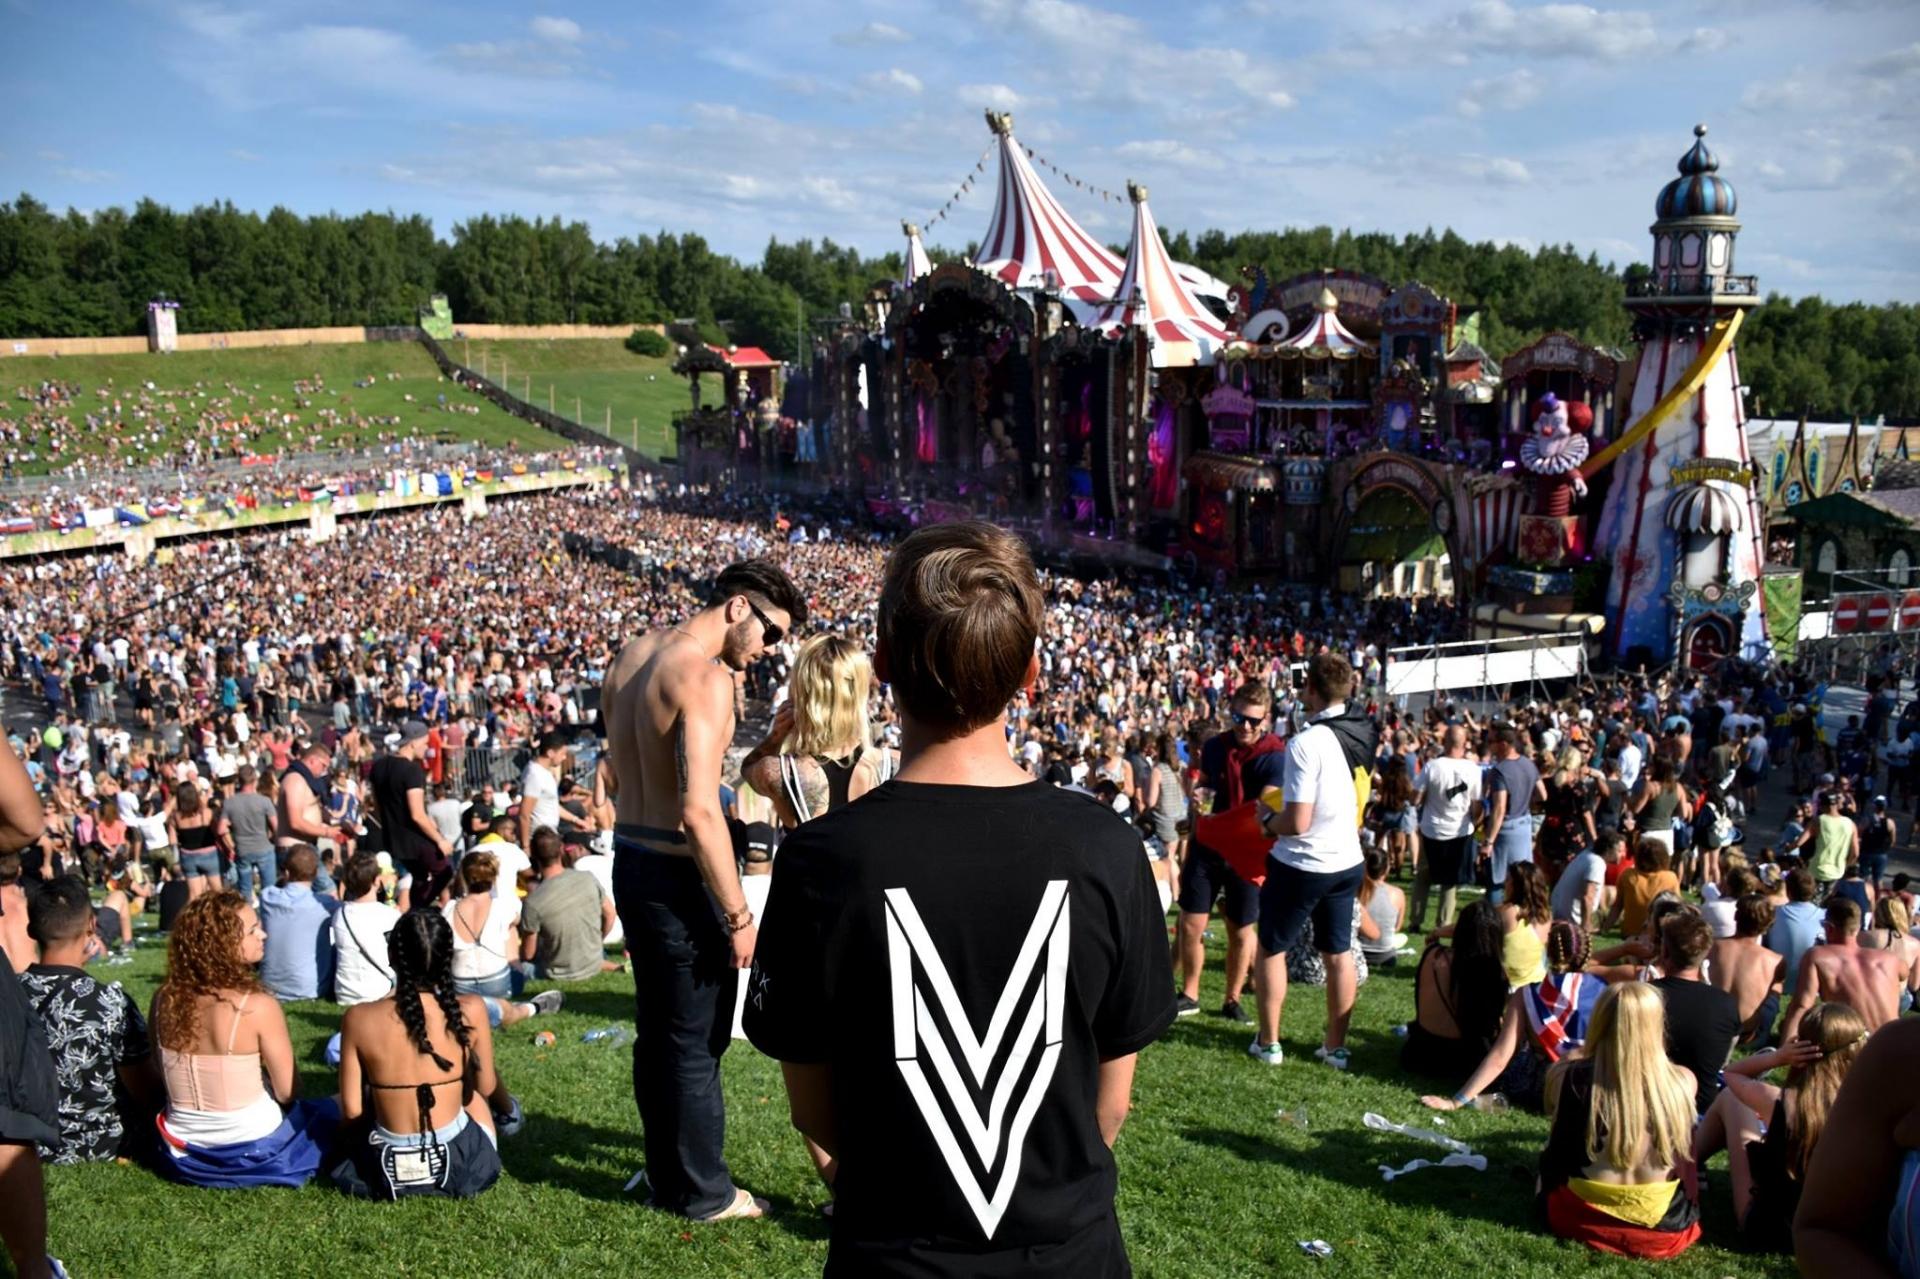 Mark Villa Tomorrowland aftermovie